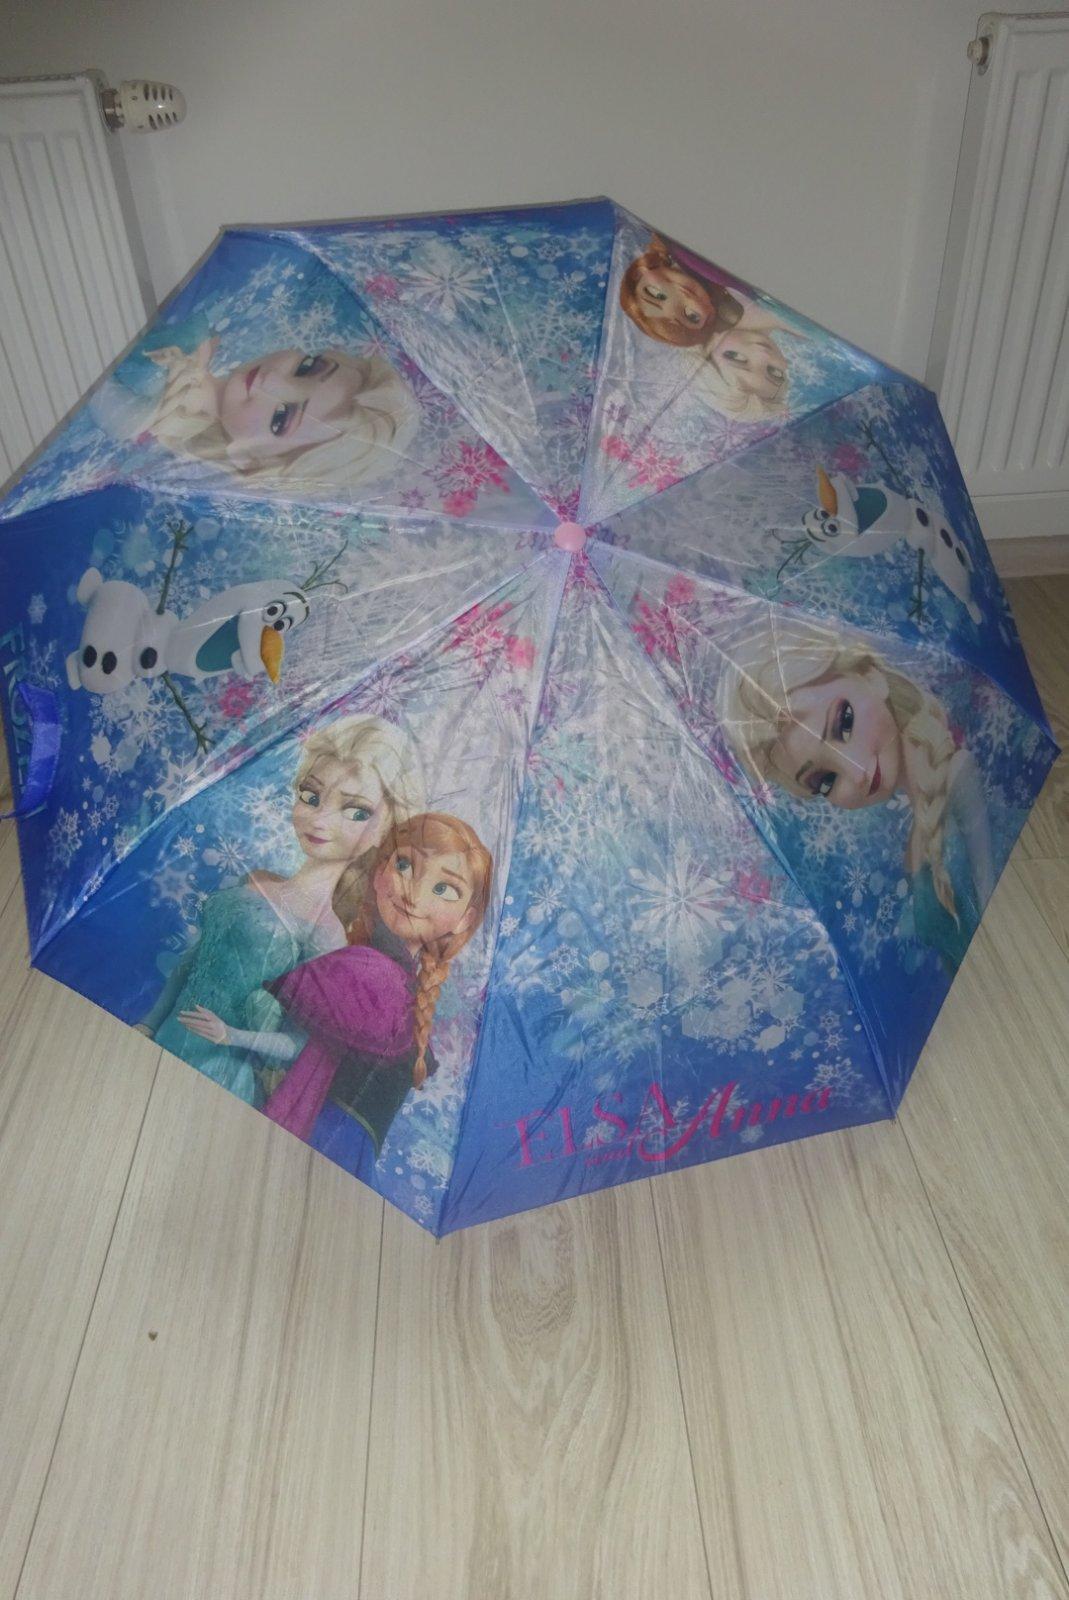 97a2a0aba82b3 Dáždnik frozen, - 6,30 € od predávajúcej aandreaa9 | Detský bazár |  ModryKonik.sk